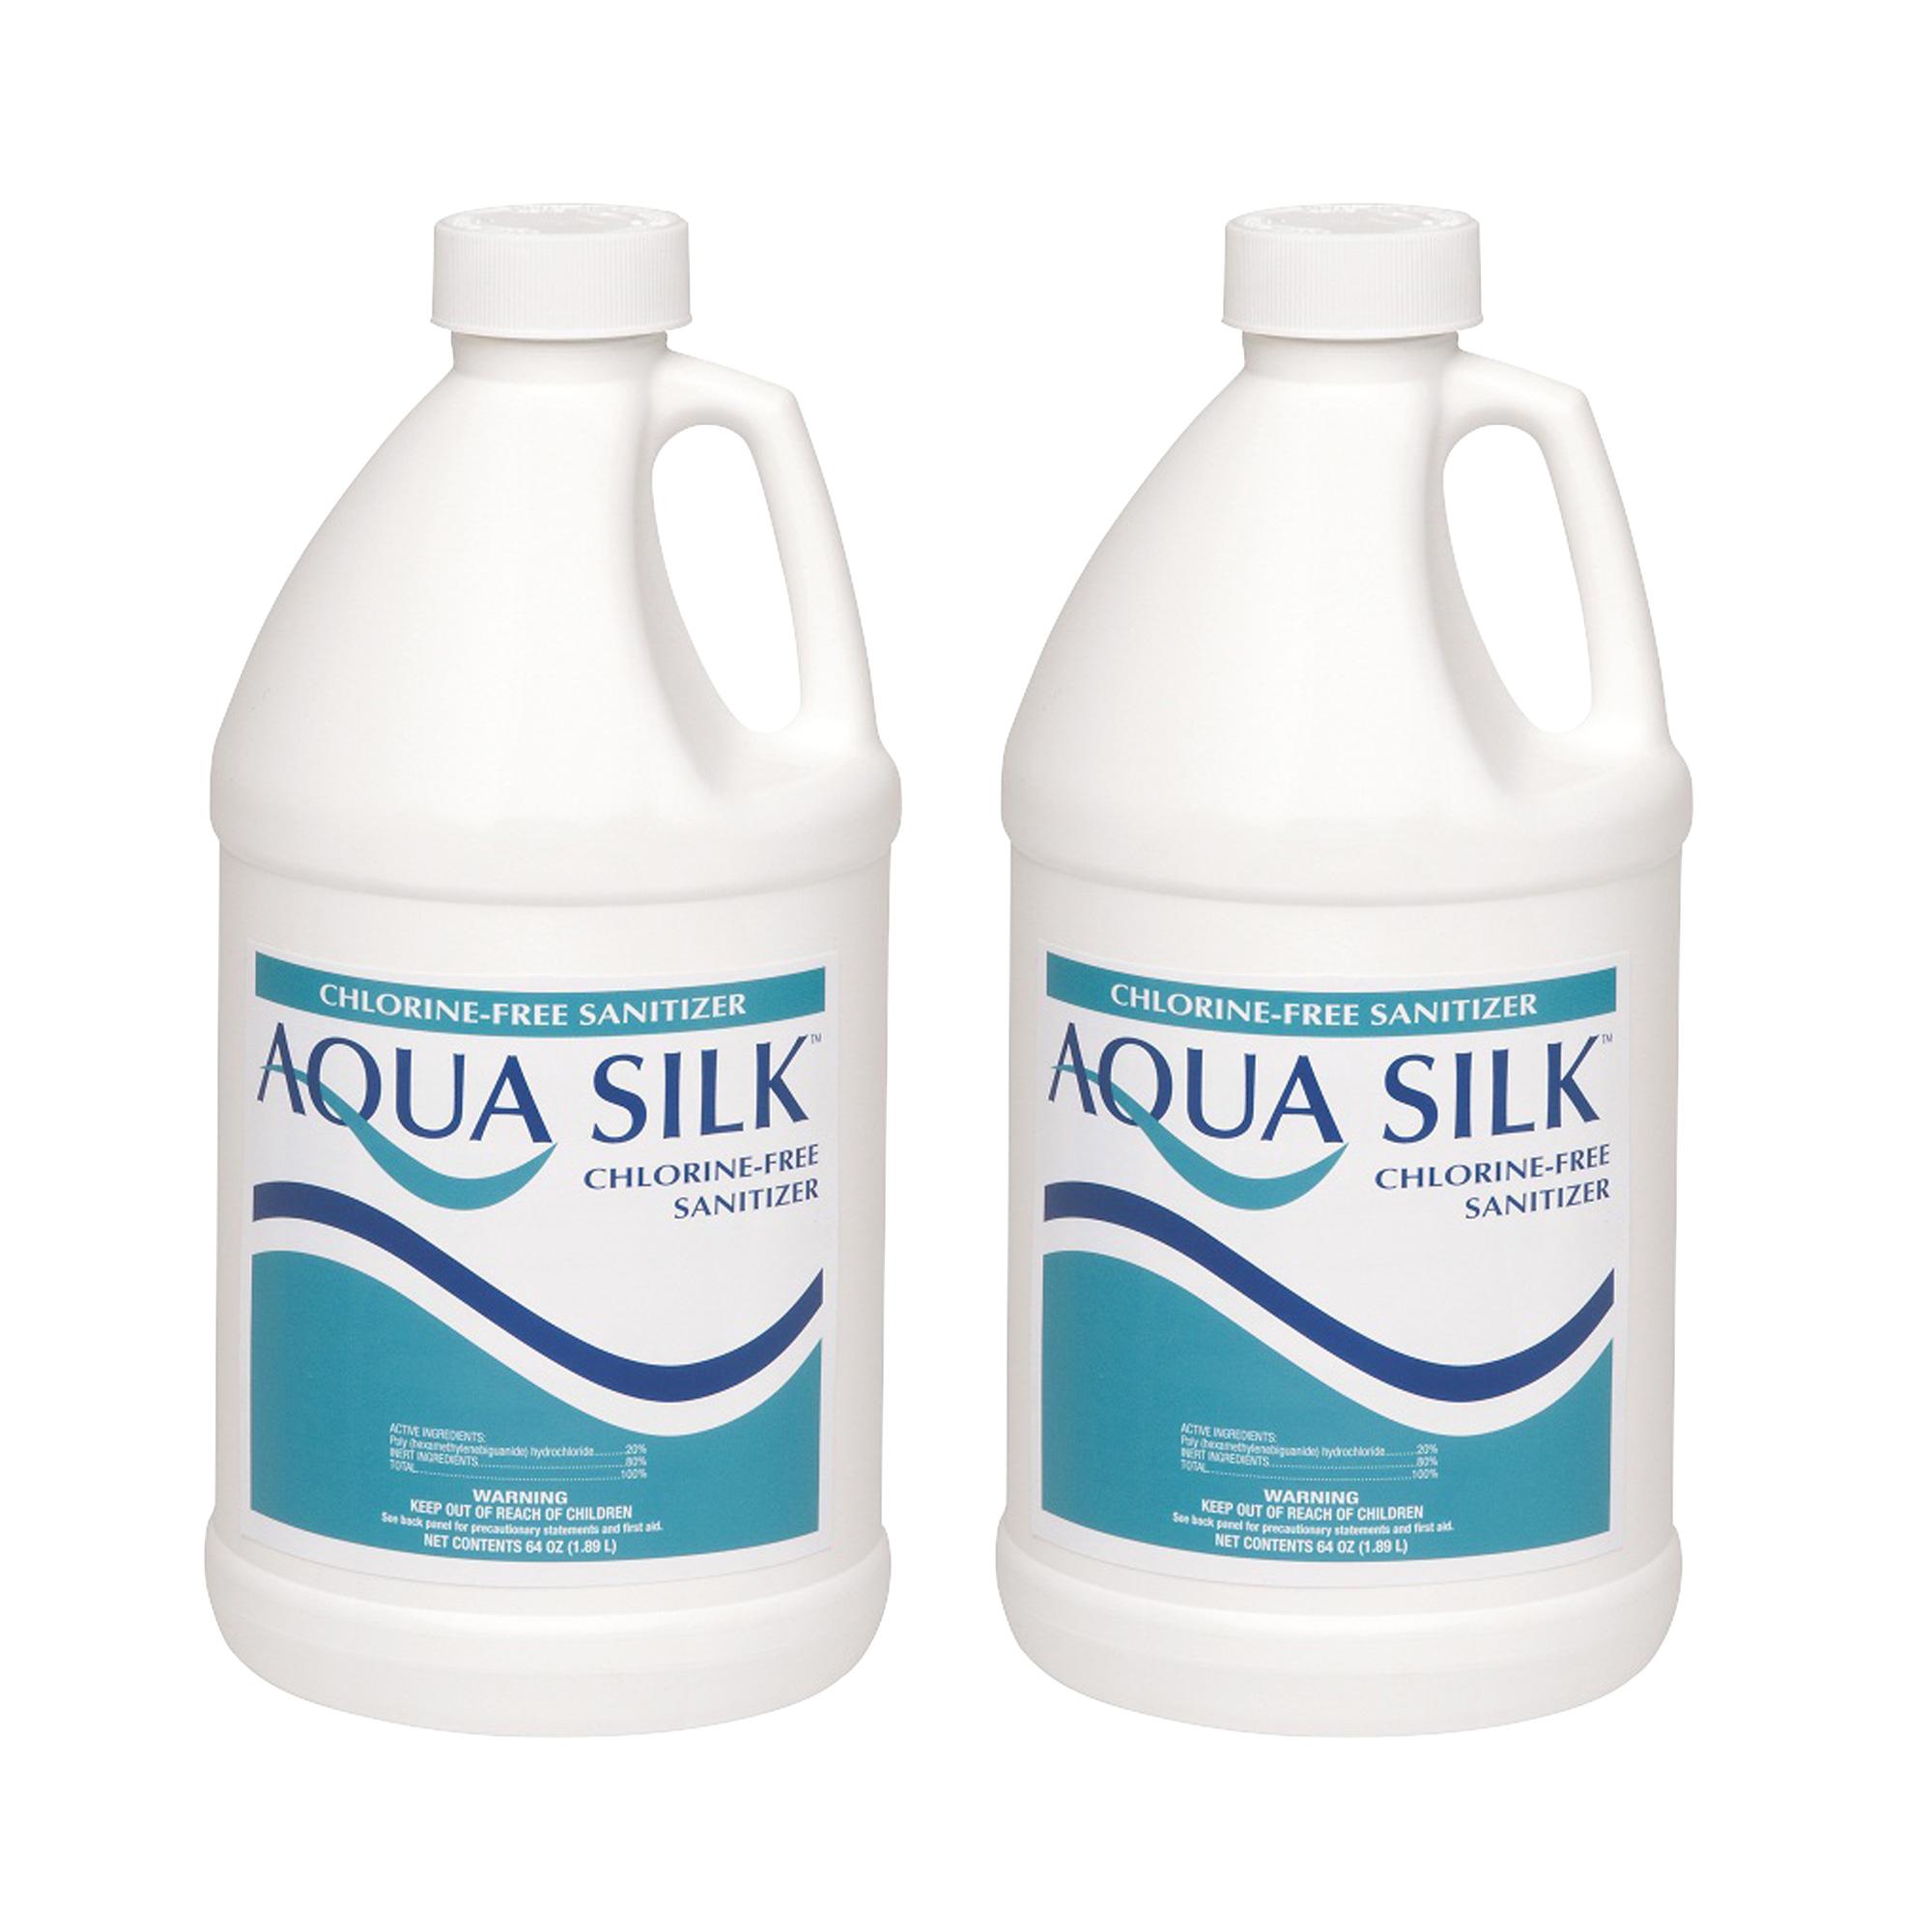 Aqua Silk 1 2 Gallon Chlorine Free Alternative Swimming Pool Sanitizer 2 Pack Ebay